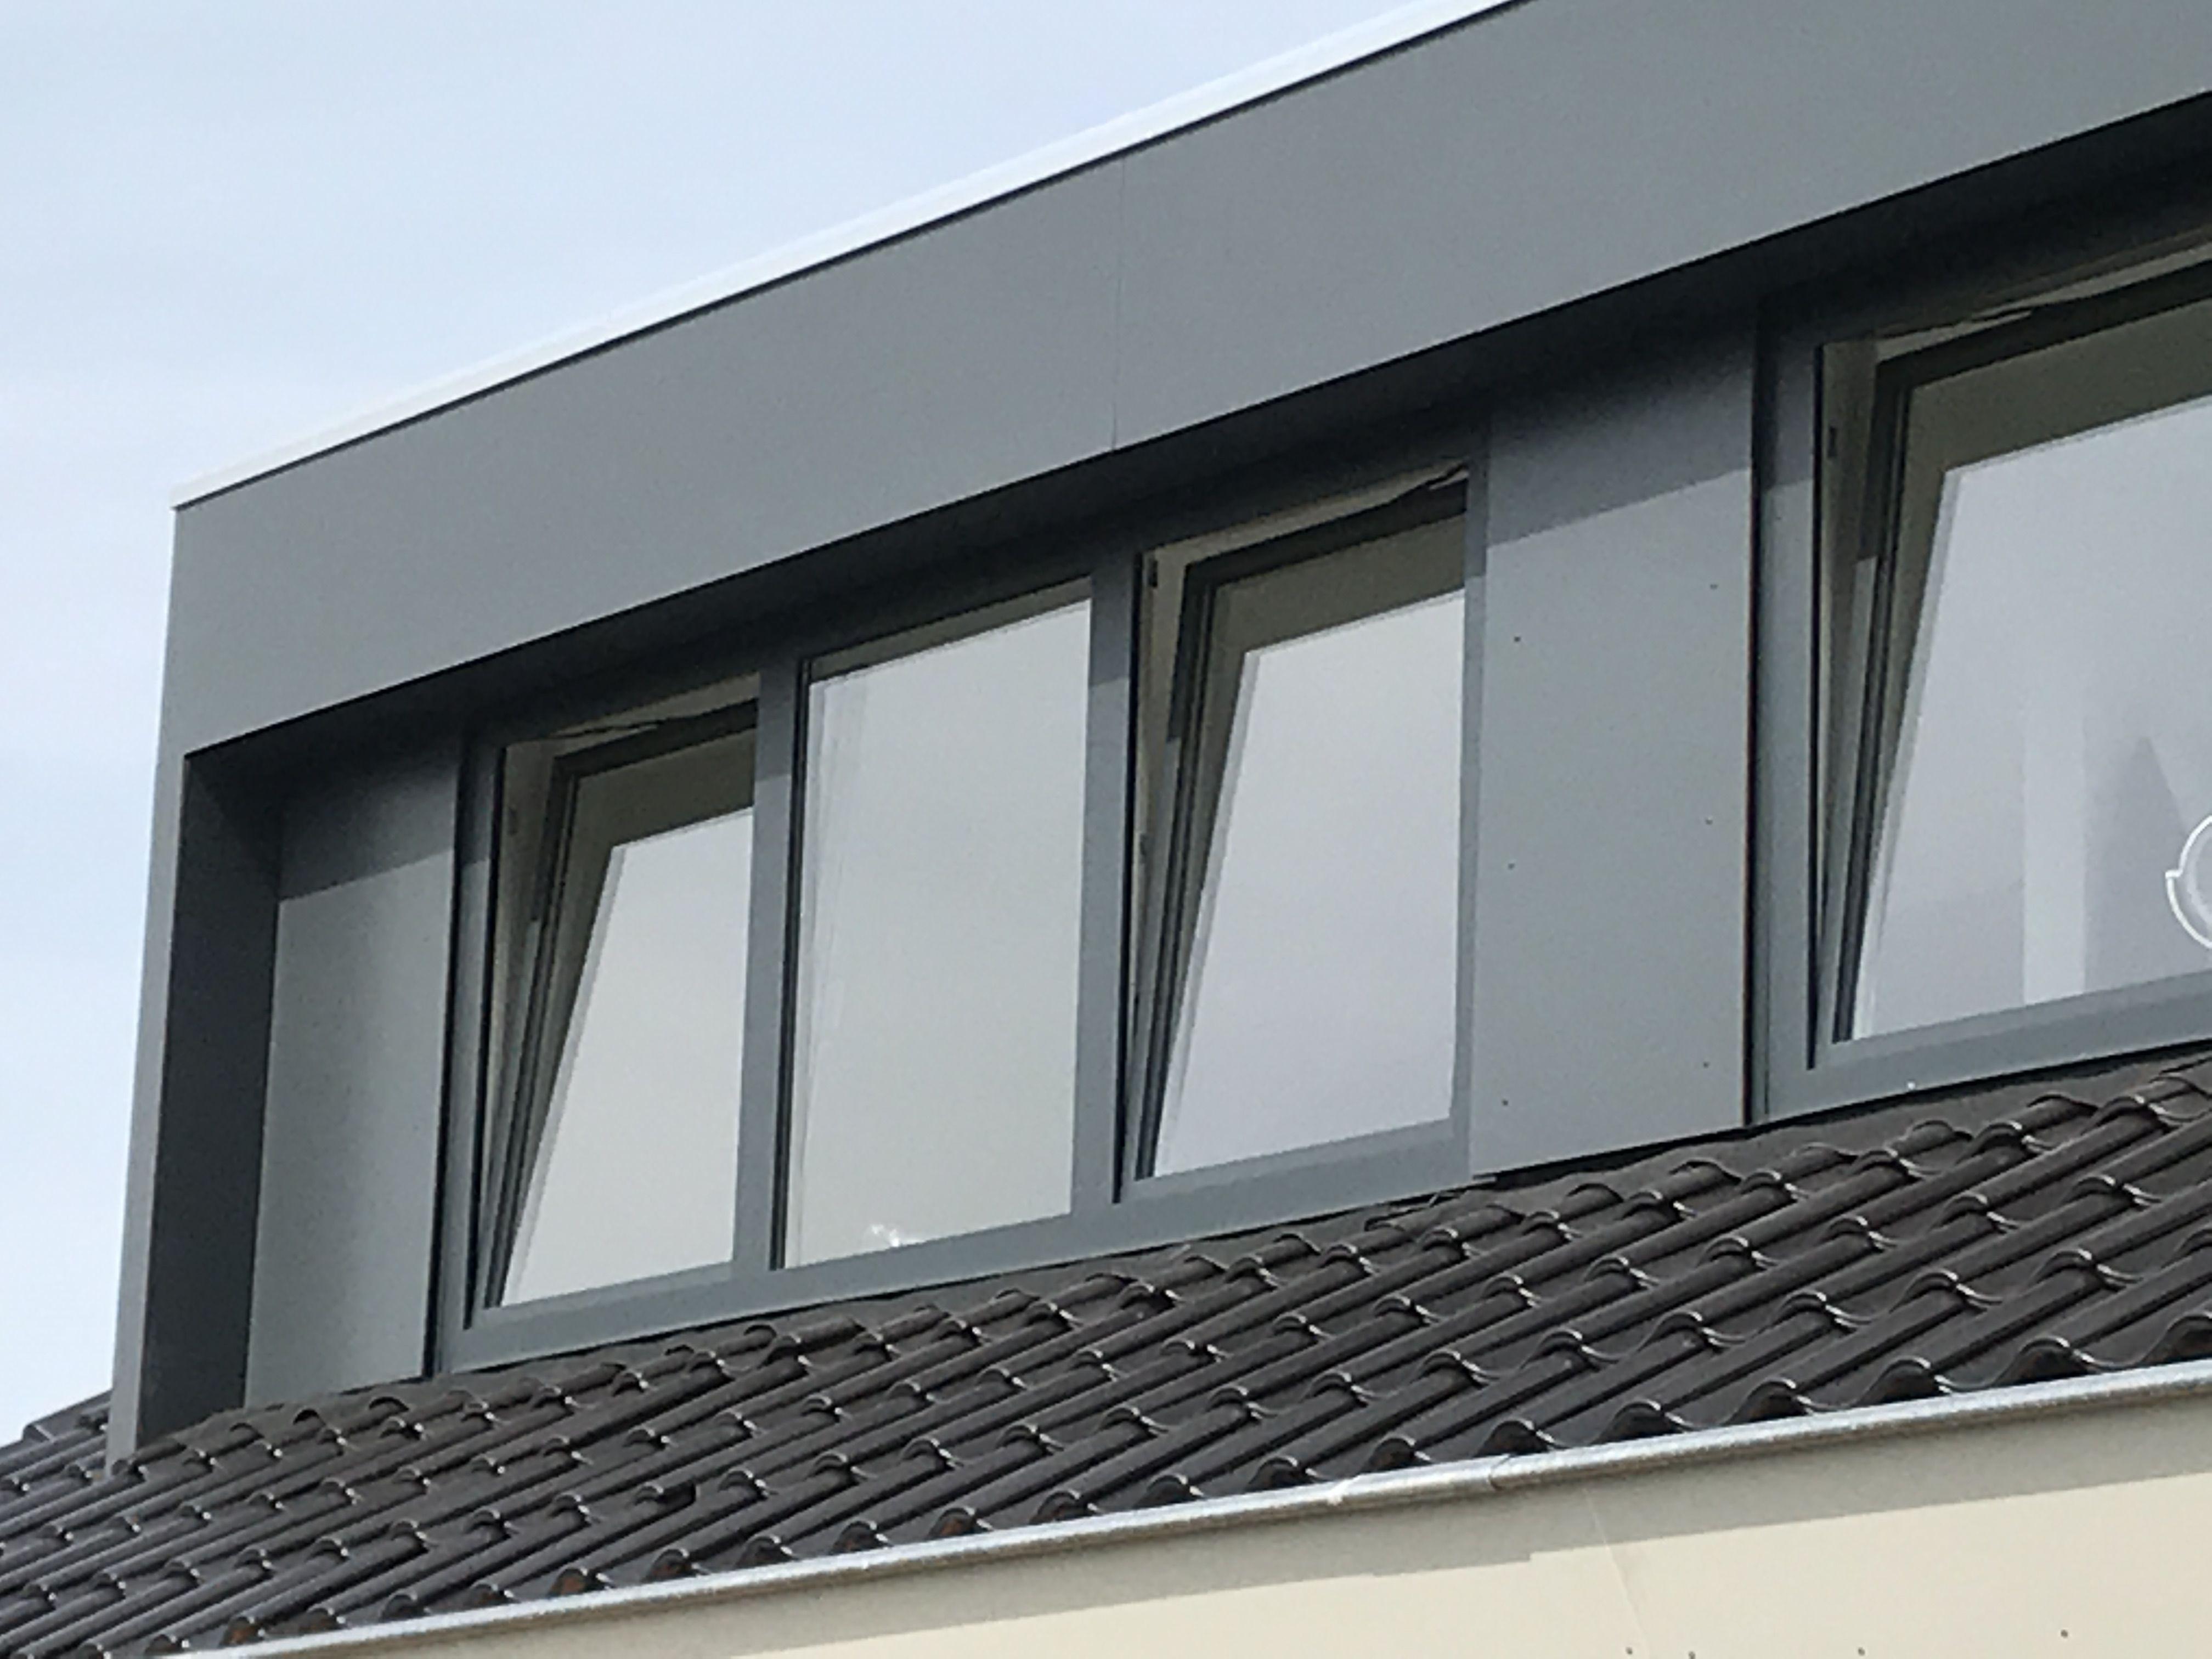 Hout aluminium kozijnen Huis kleuren buitenkant, Hout